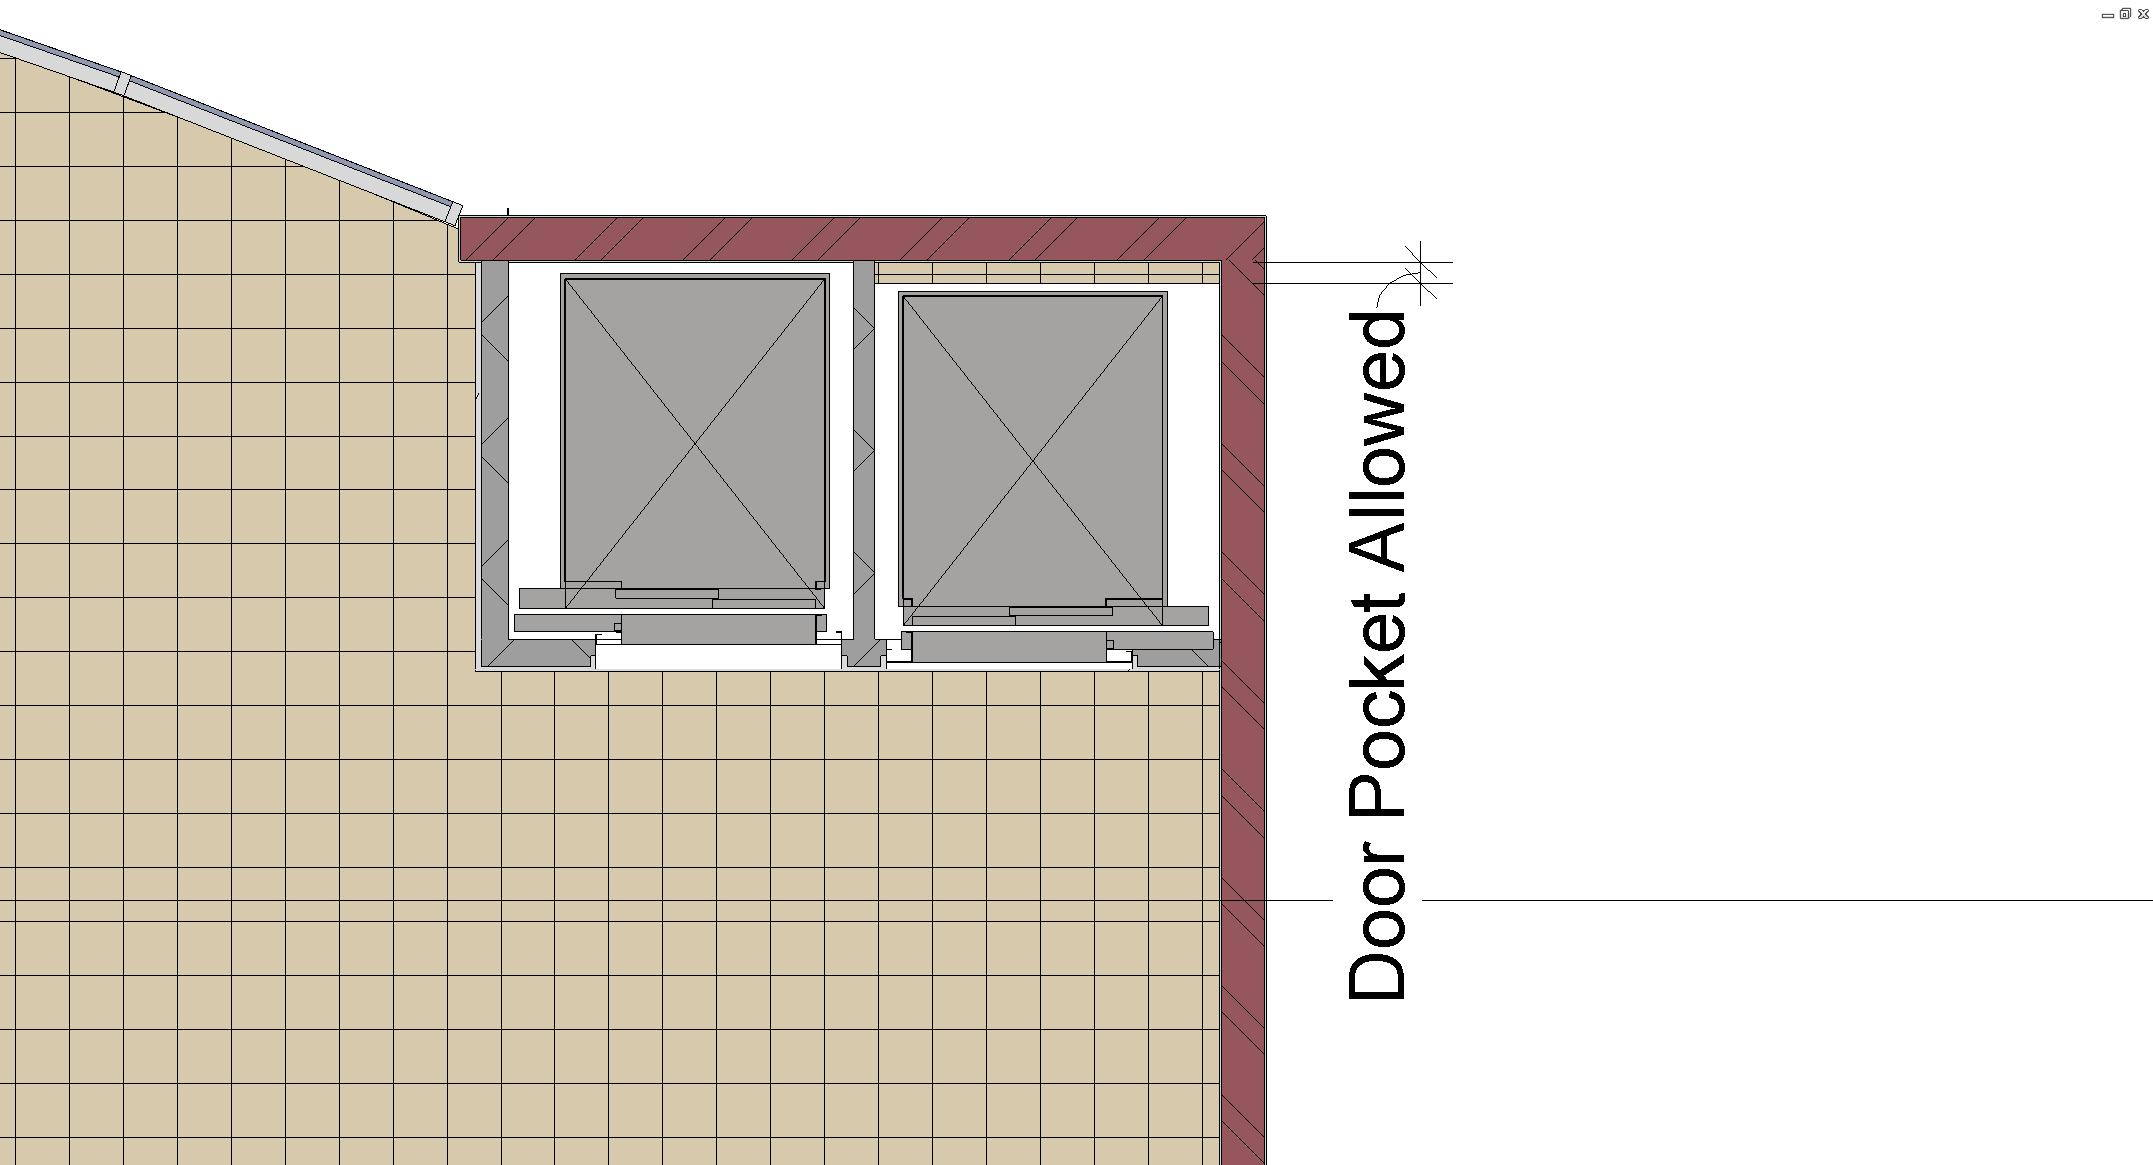 More than 800 configurations: Schindler 3300 as 3D BIM